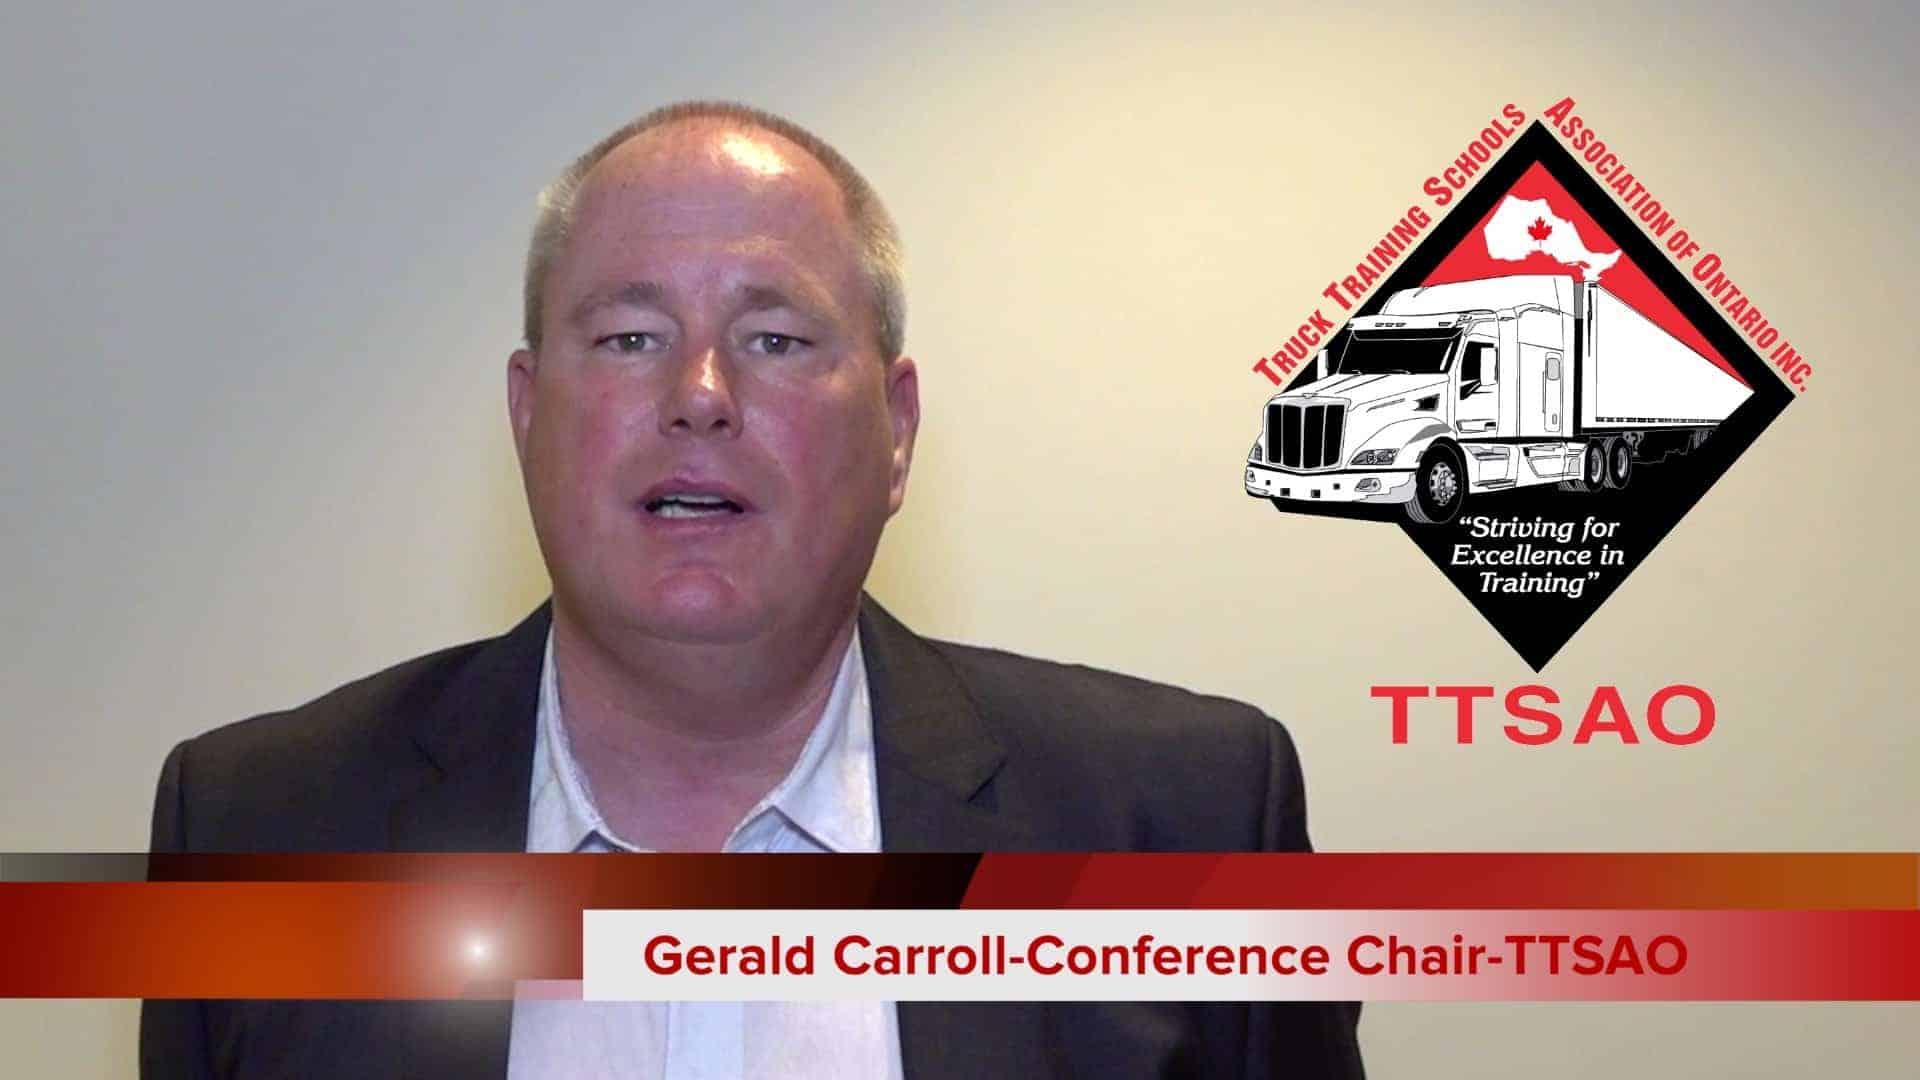 TTSAO TESTIMONIAL-GERALD CARROL